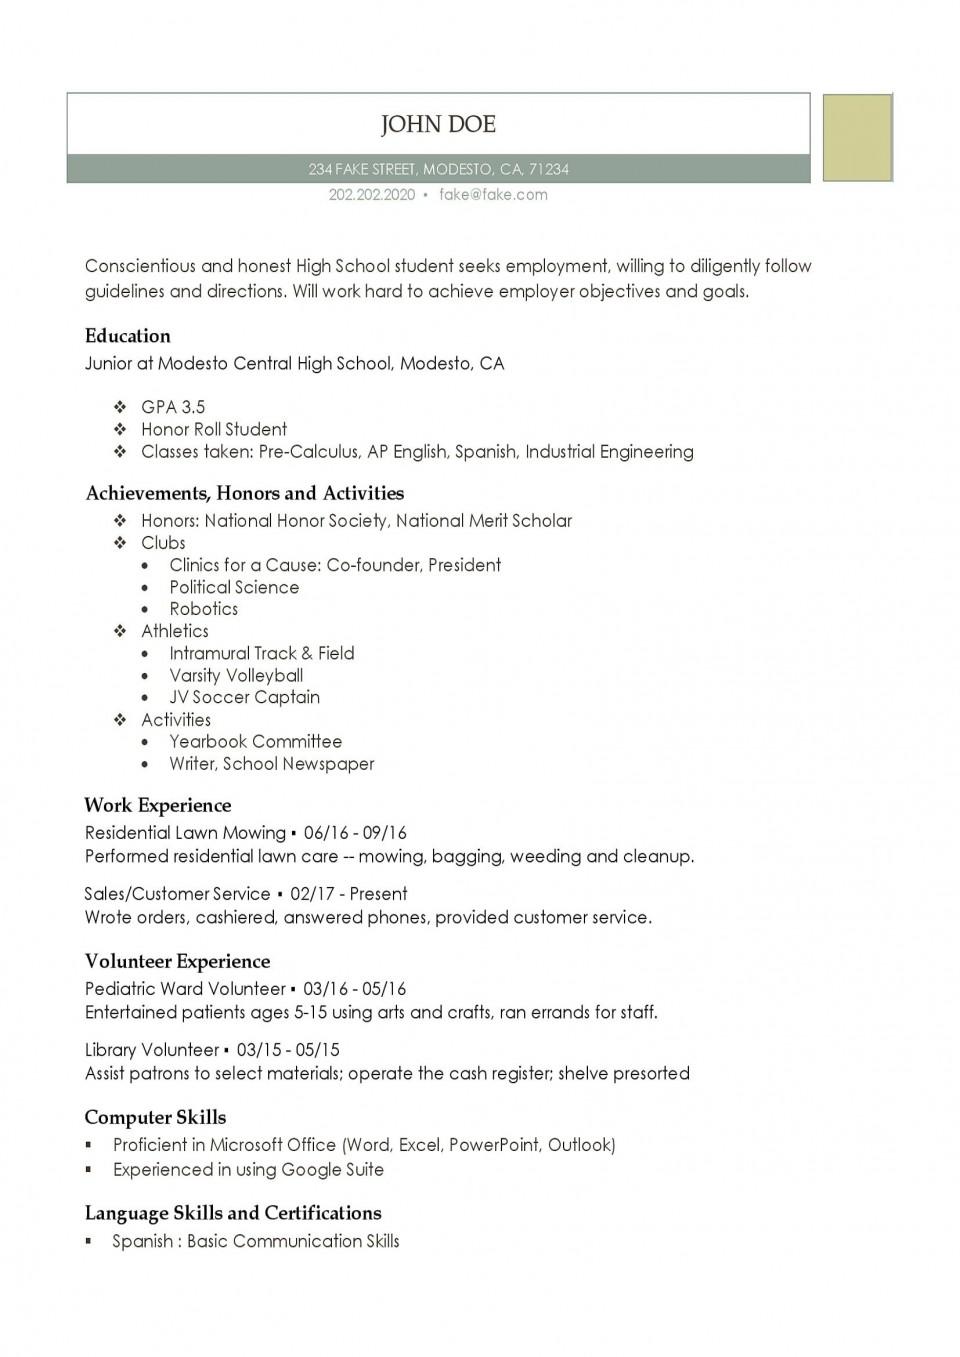 003 Stunning Resume Template For Teen Design  Teenager First Job Australia960